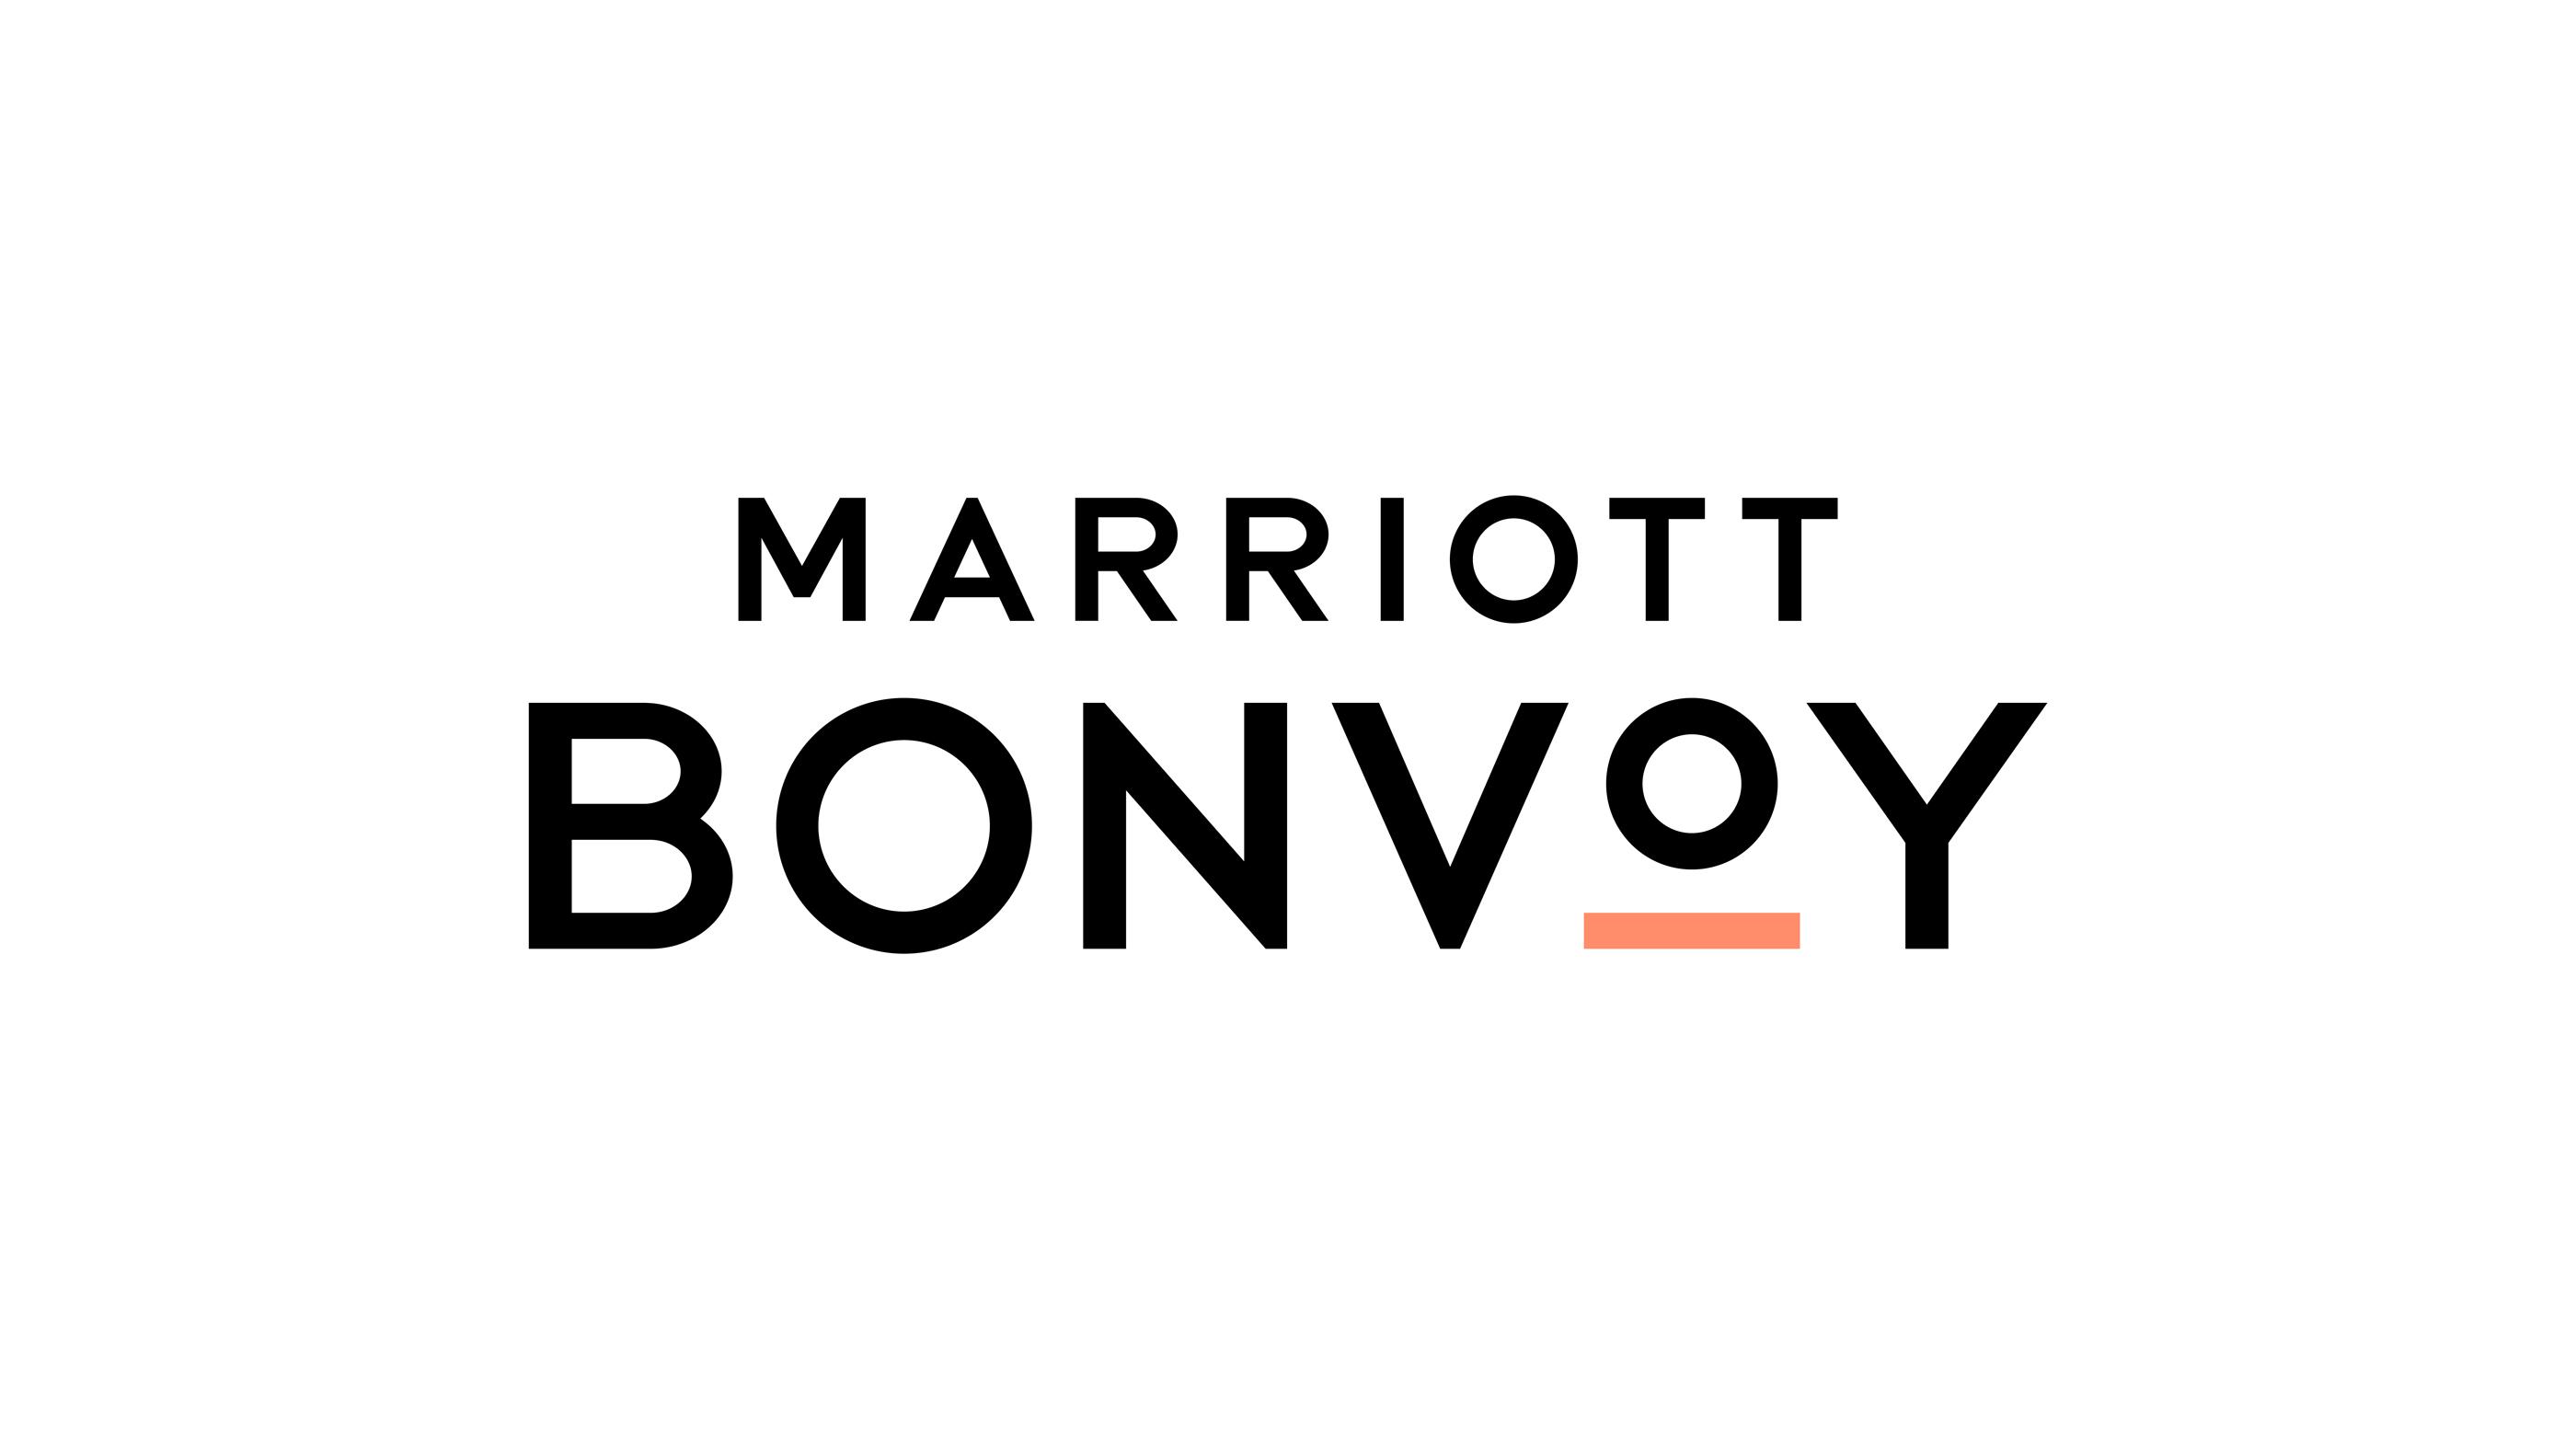 MotherDesign_MarriottBonvoy_01a